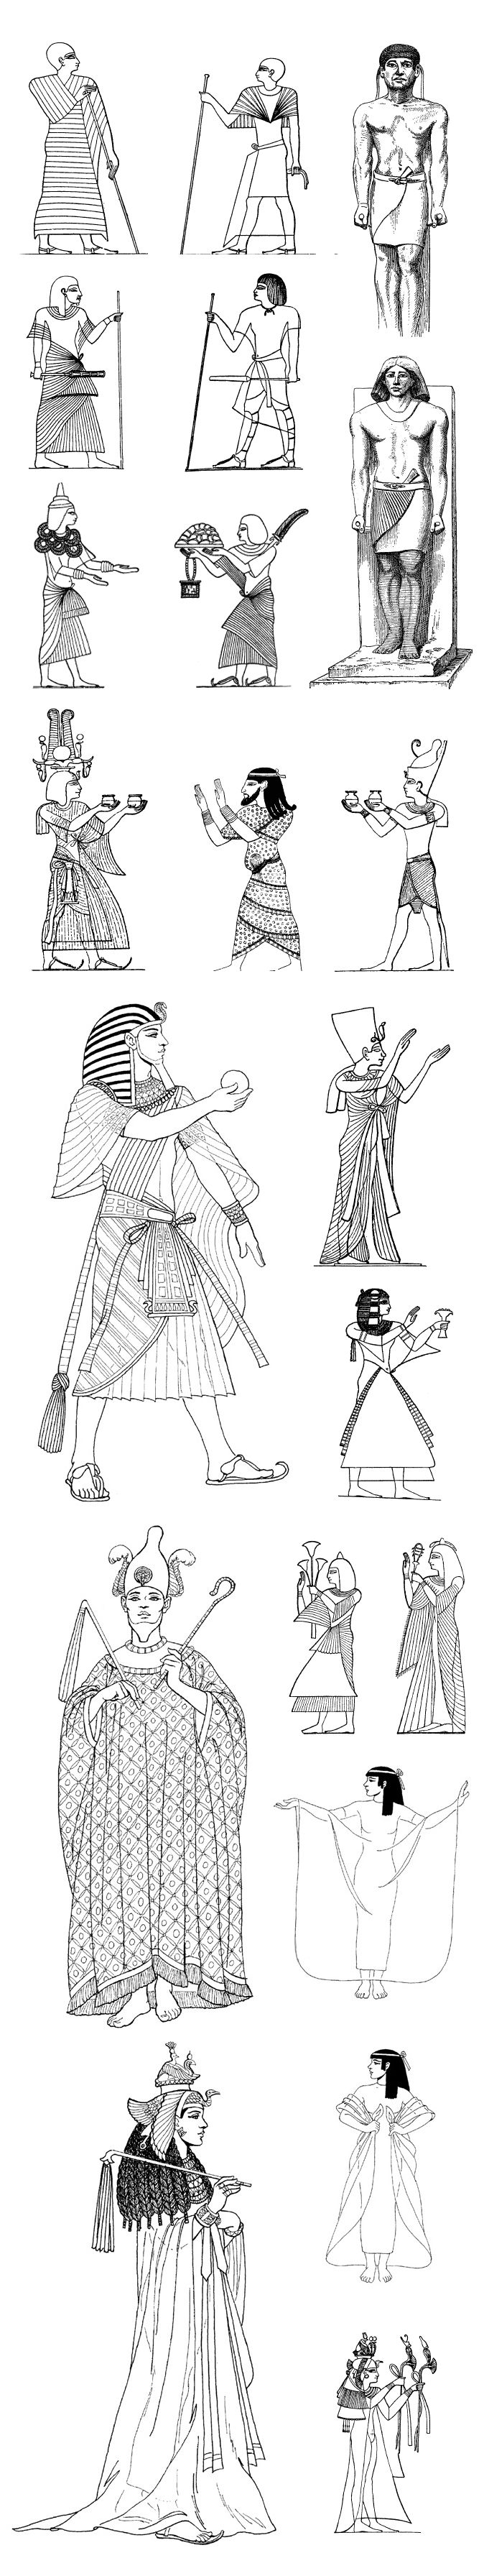 Pharaohs, queens, Egypt